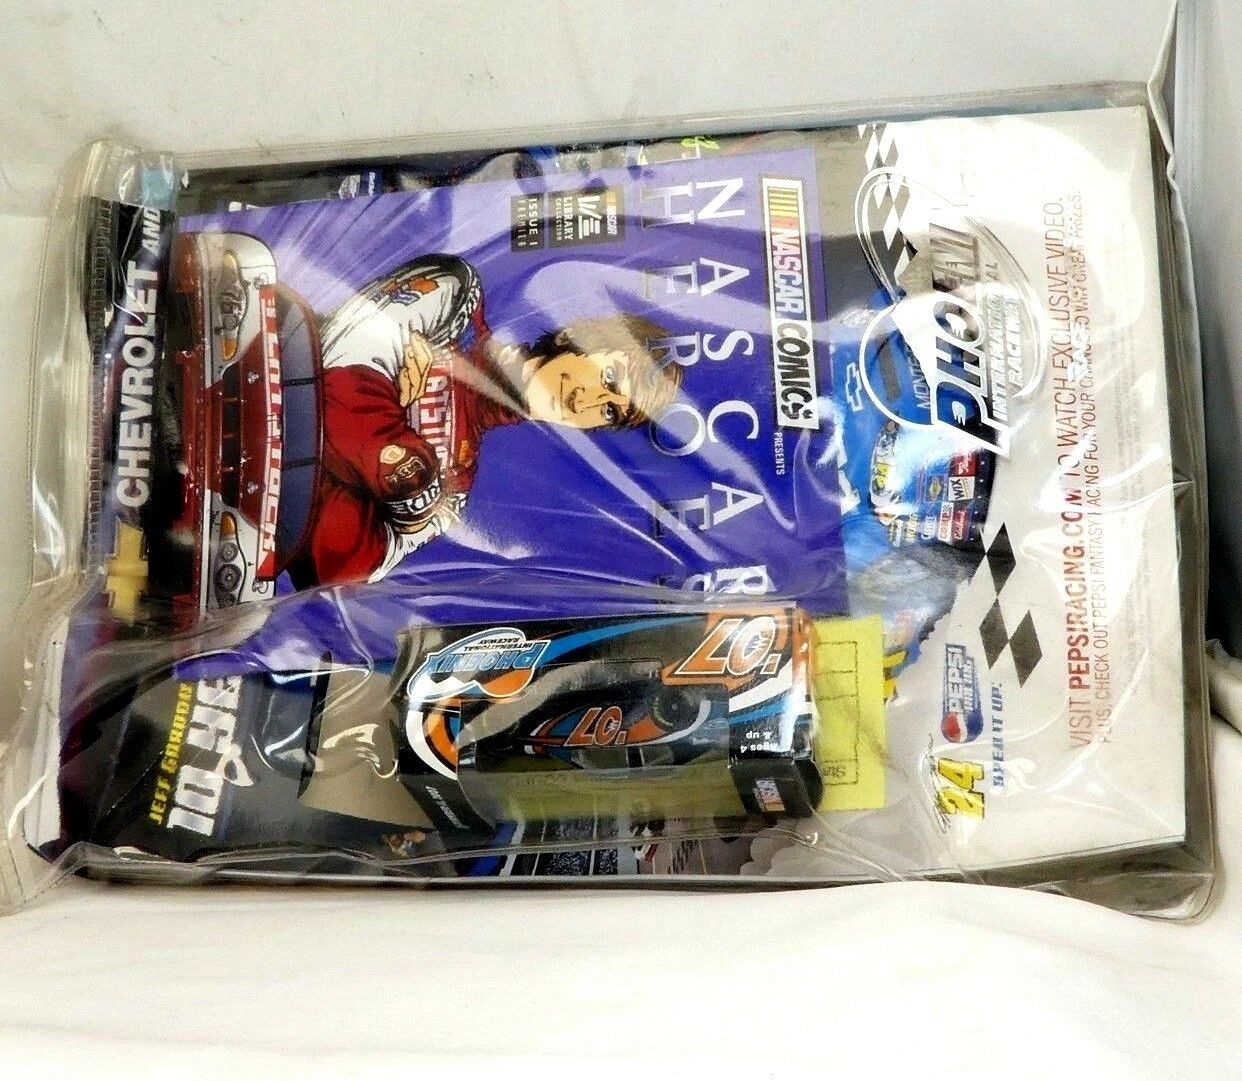 Nascar 2007 Phoenix raceway November 11 diecast car comics magazine w  poster